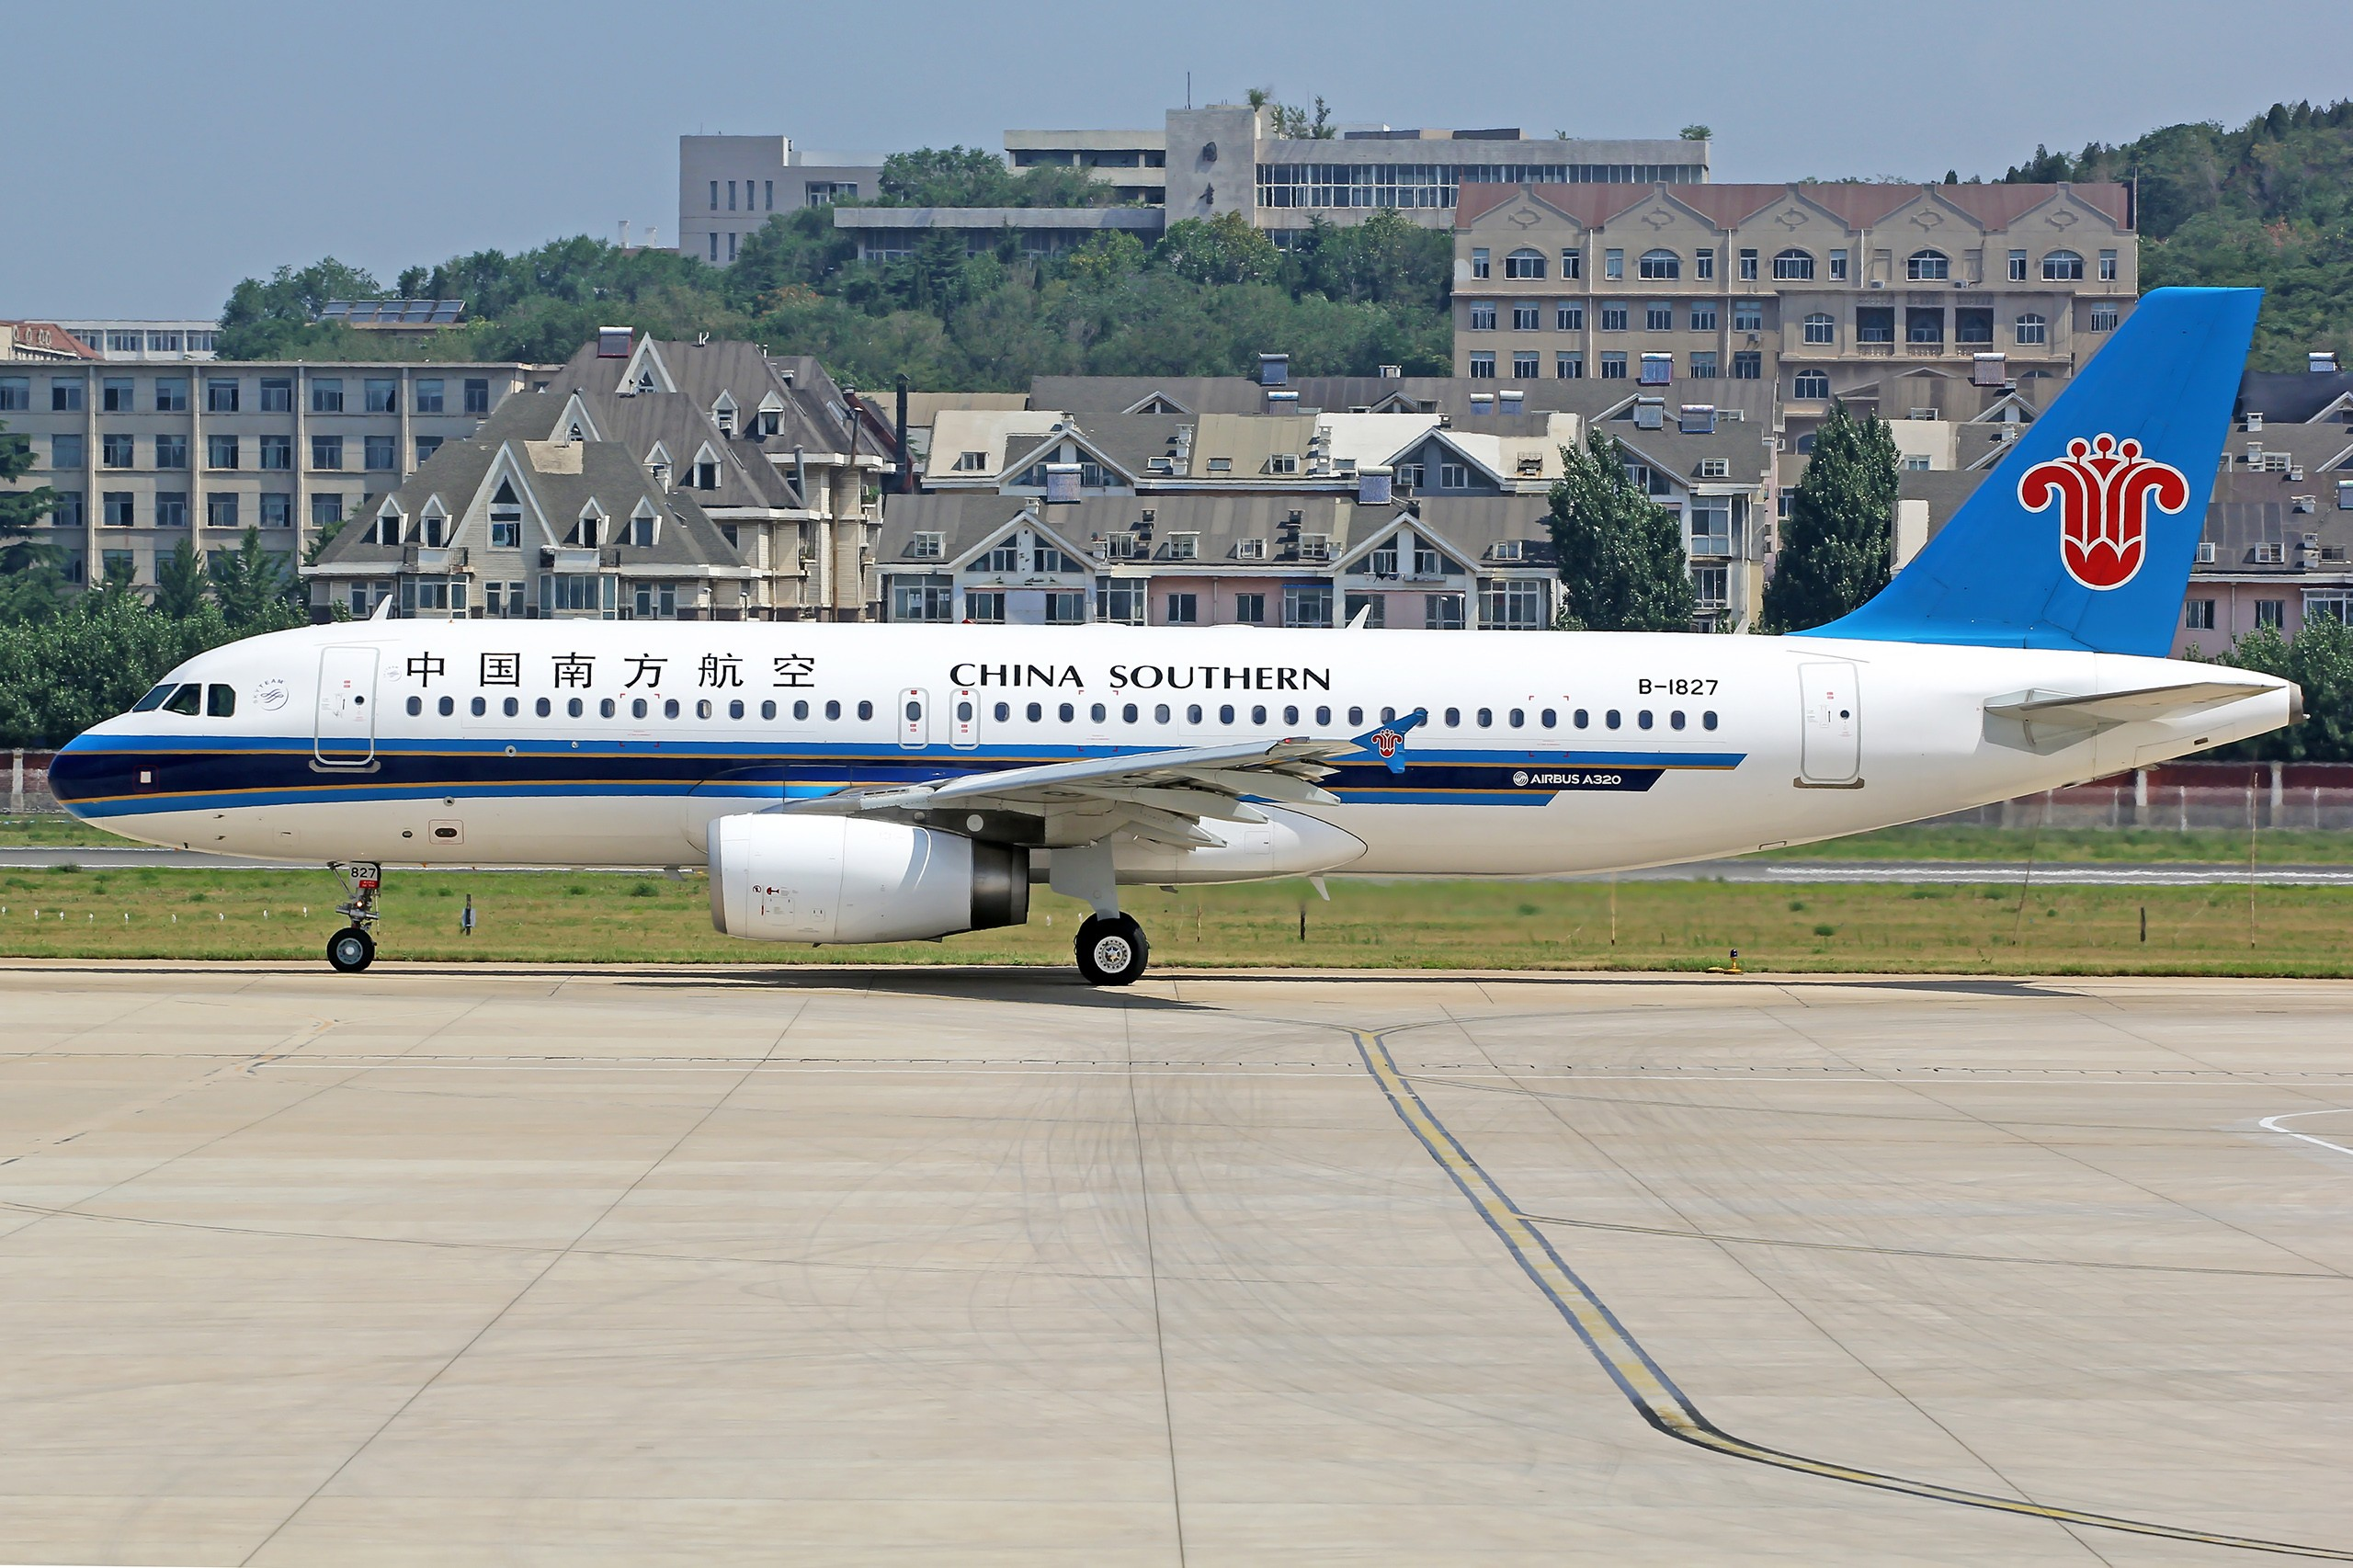 Re:[原创][DLC]。。。无标题。。。{2560x1707}Pix AIRBUS A320-200 B-1827 中国大连周水子国际机场